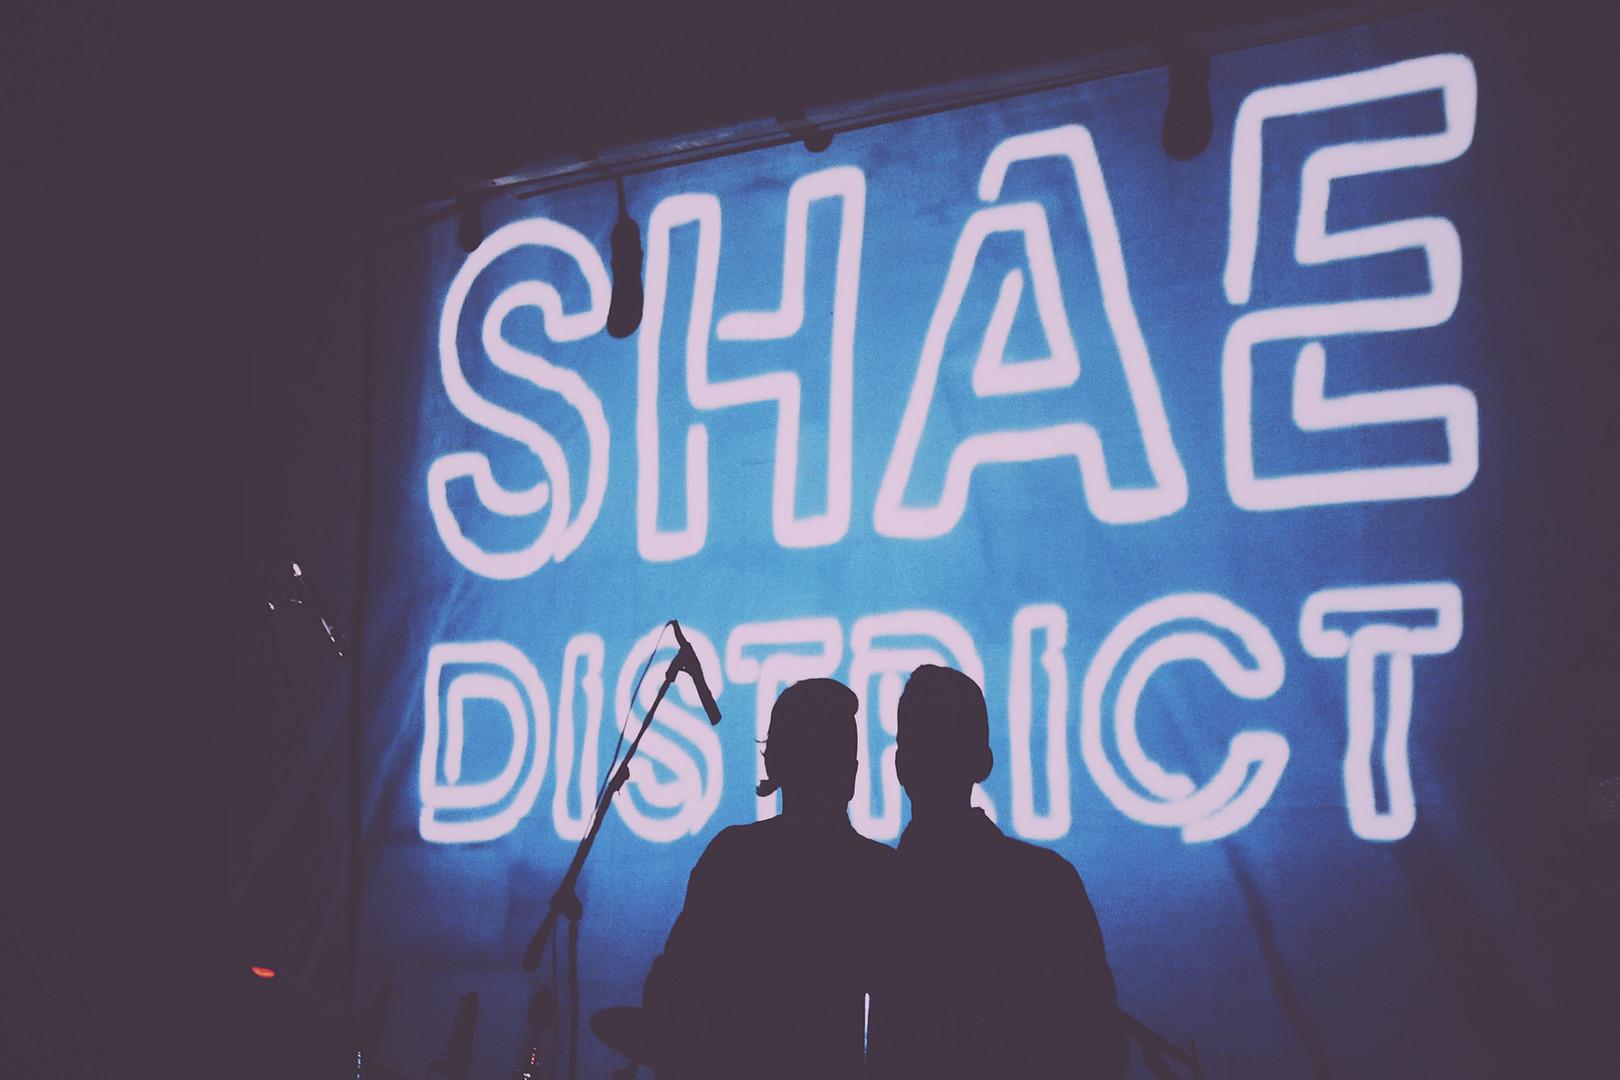 Shae District 01